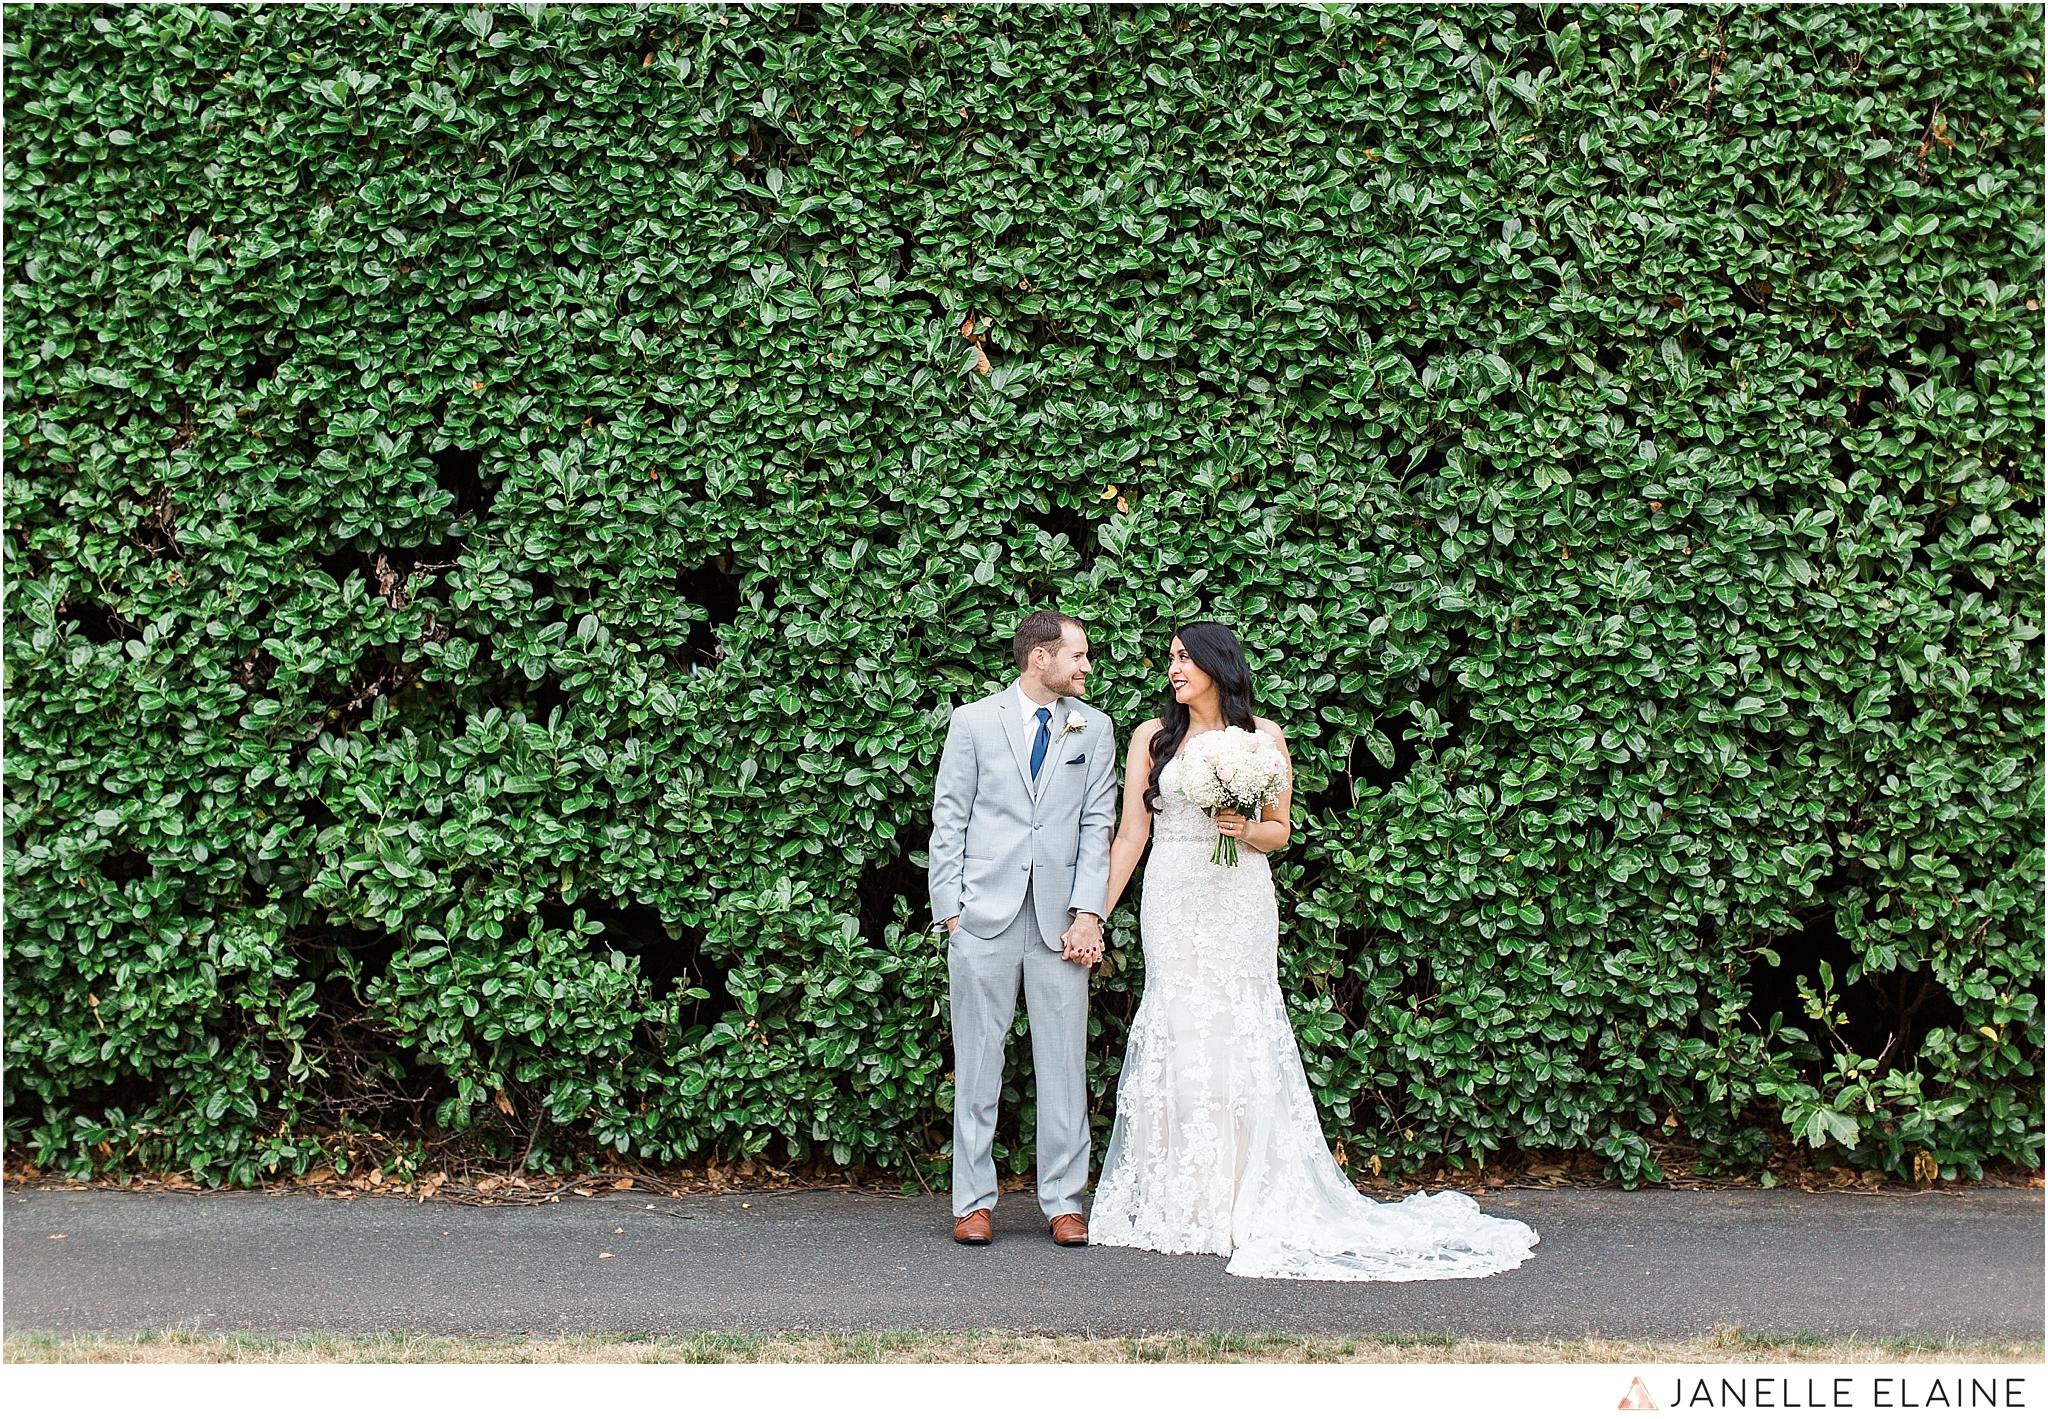 janelle elaine photography-professional wedding photographer-seattle-bellevue-robinswood house-207.jpg